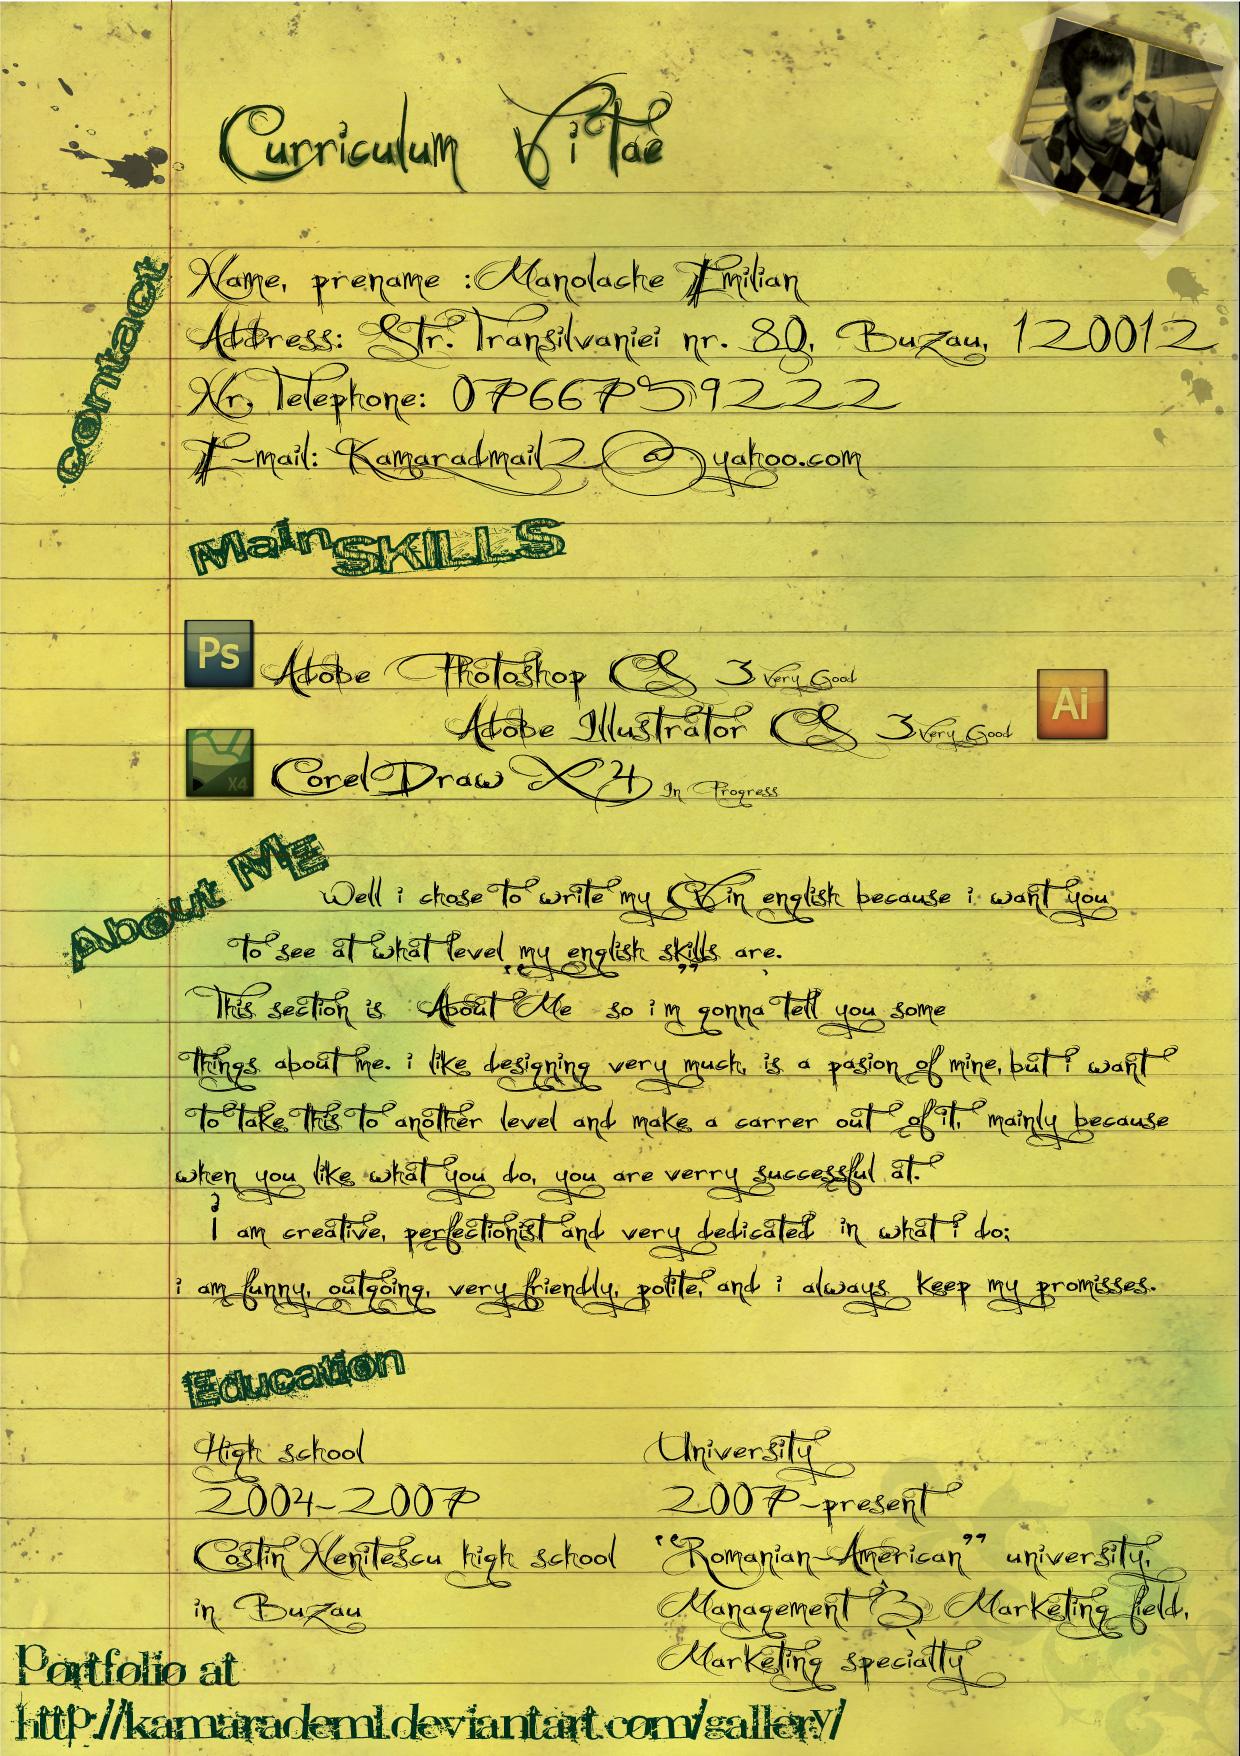 CV by kamarademl